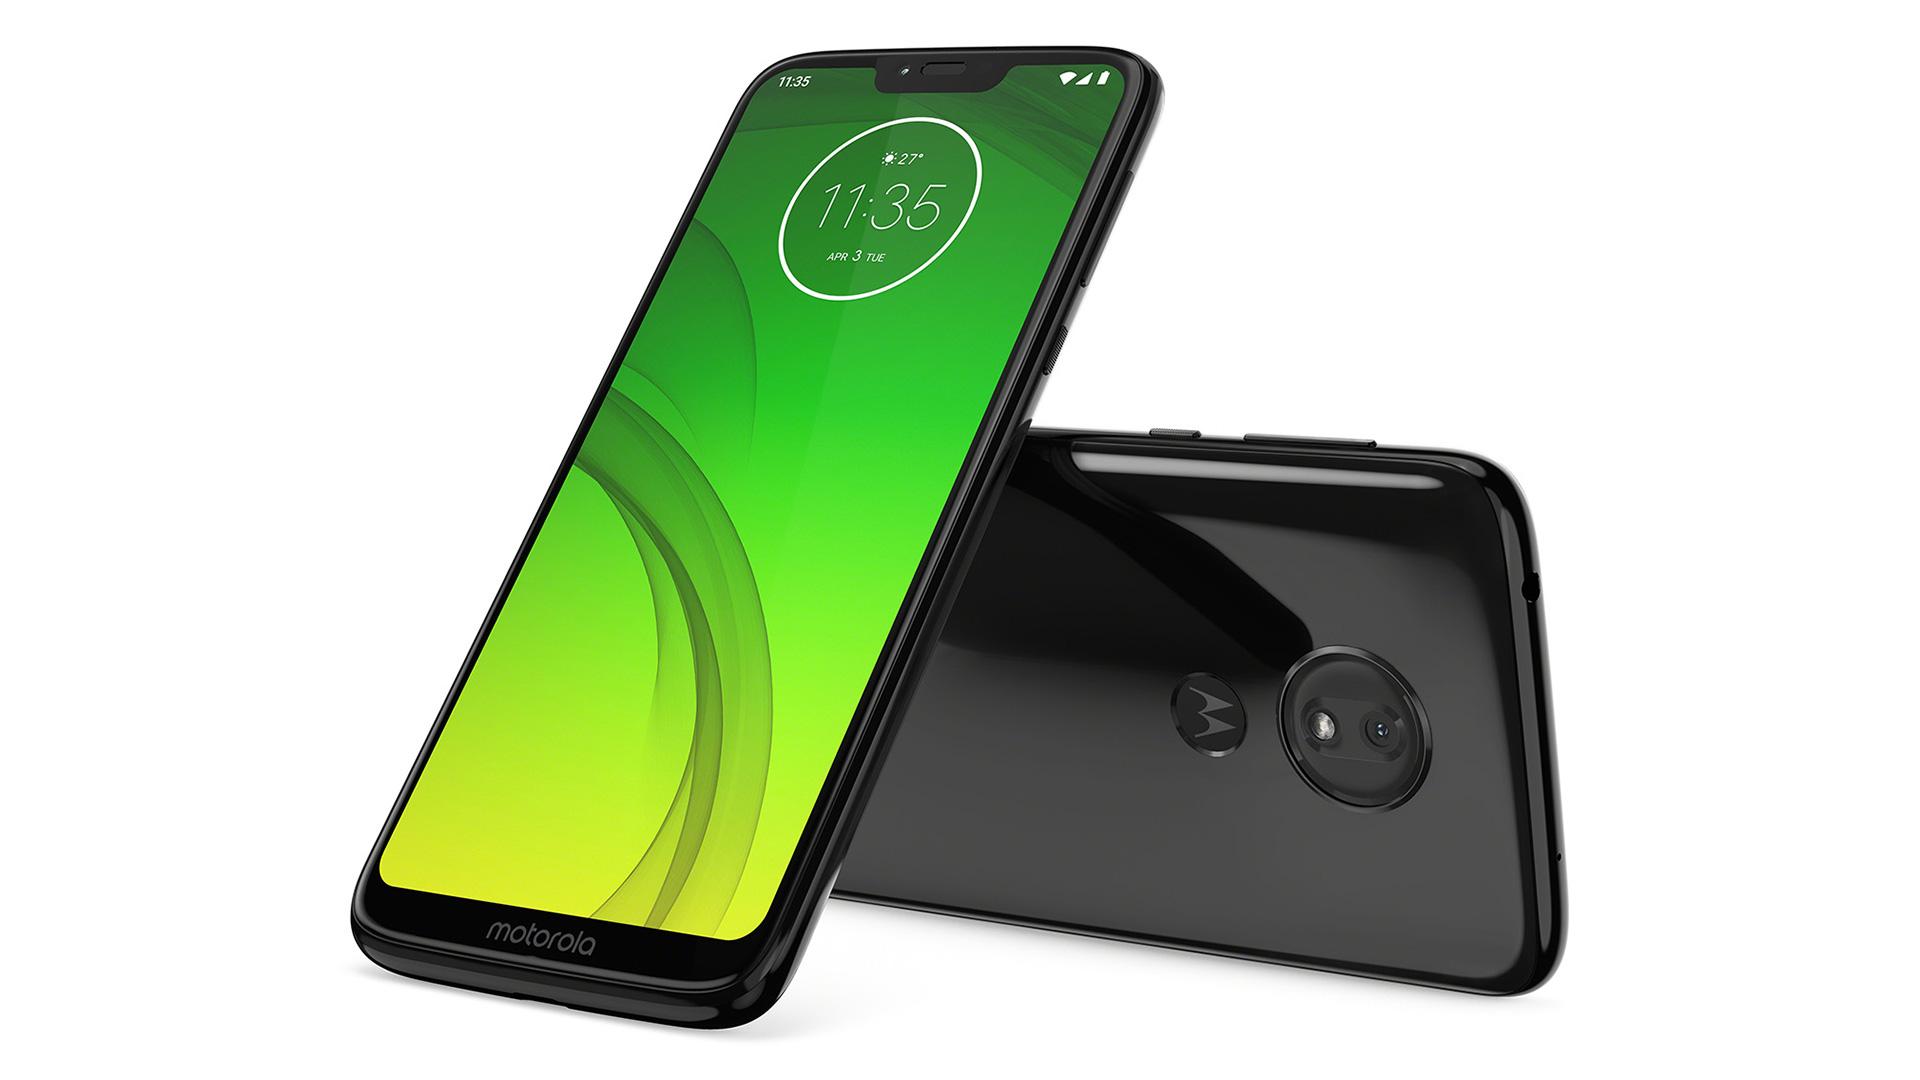 Motorola Moto G7 Power Smartphone Review - NotebookCheck net Reviews